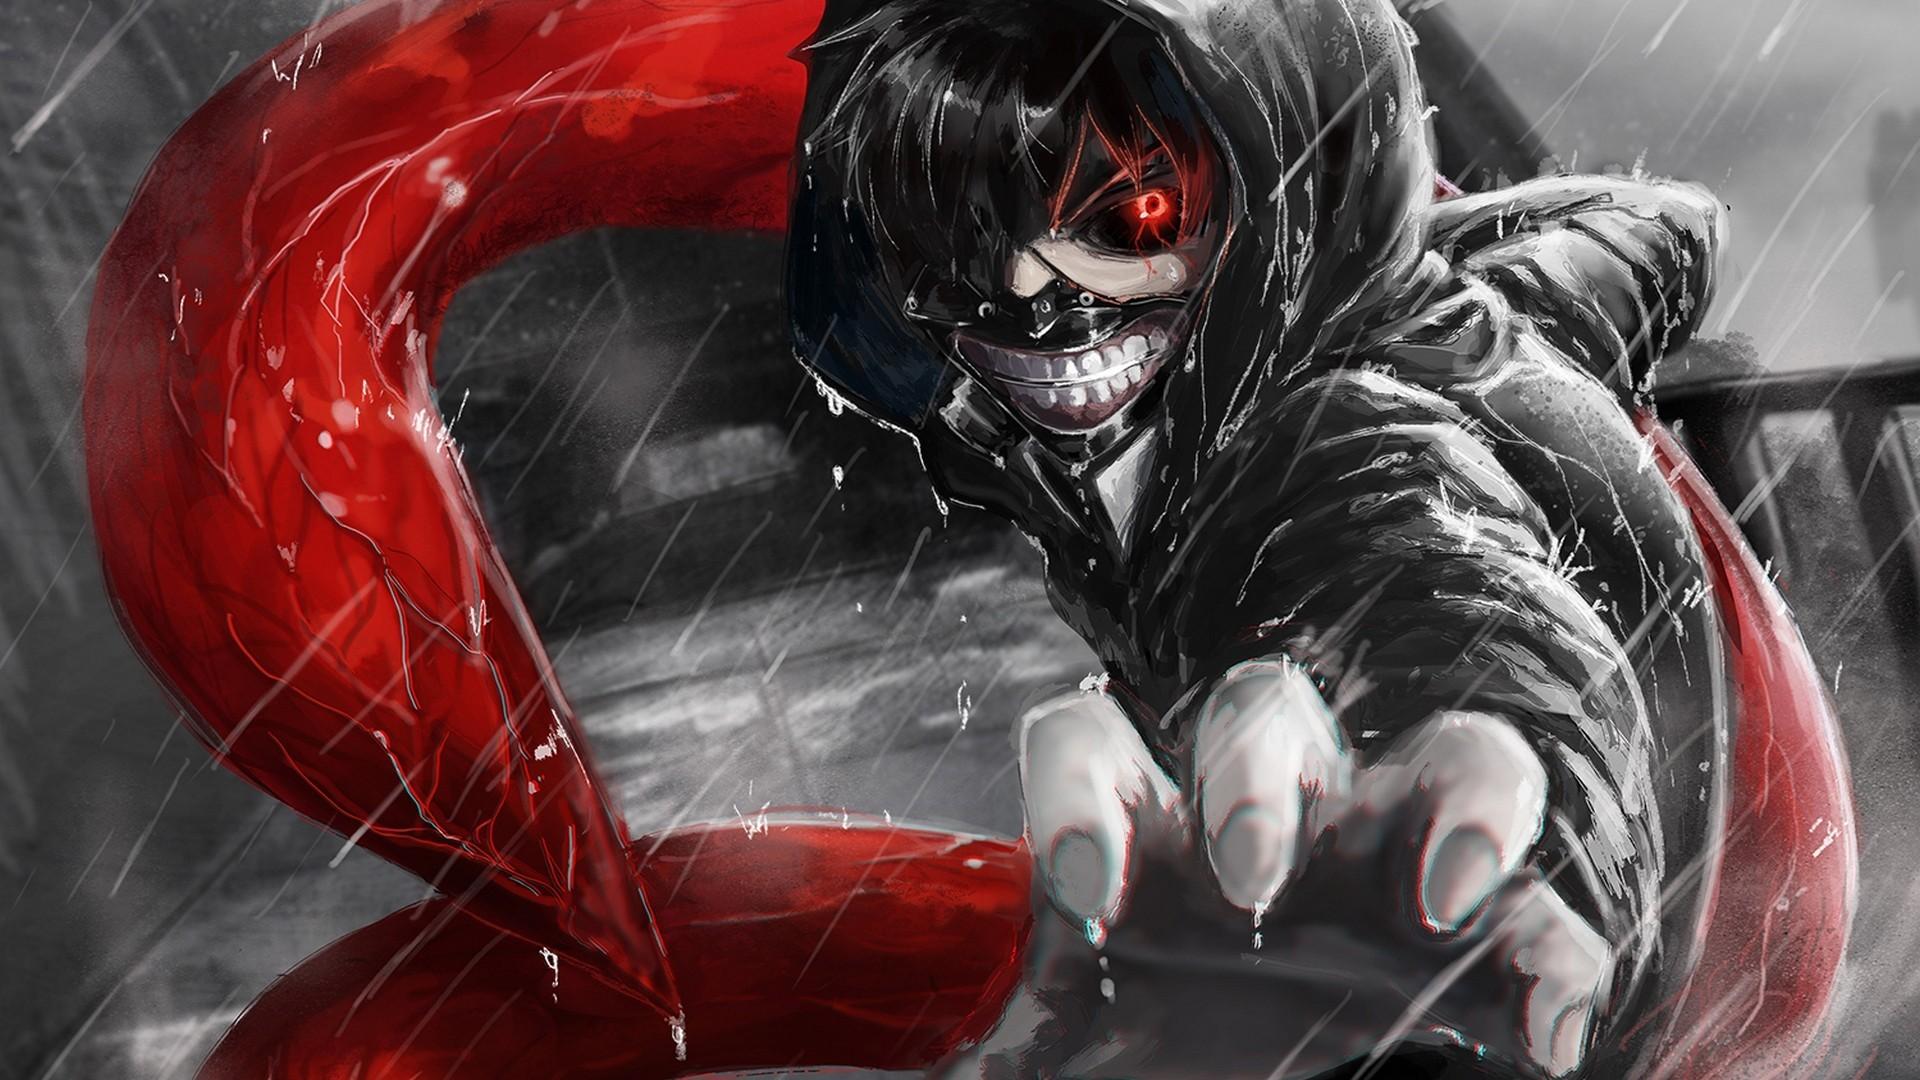 Free Download Ken Kaneki Tokyo Ghoul Wallpaper Hd Wallpaper